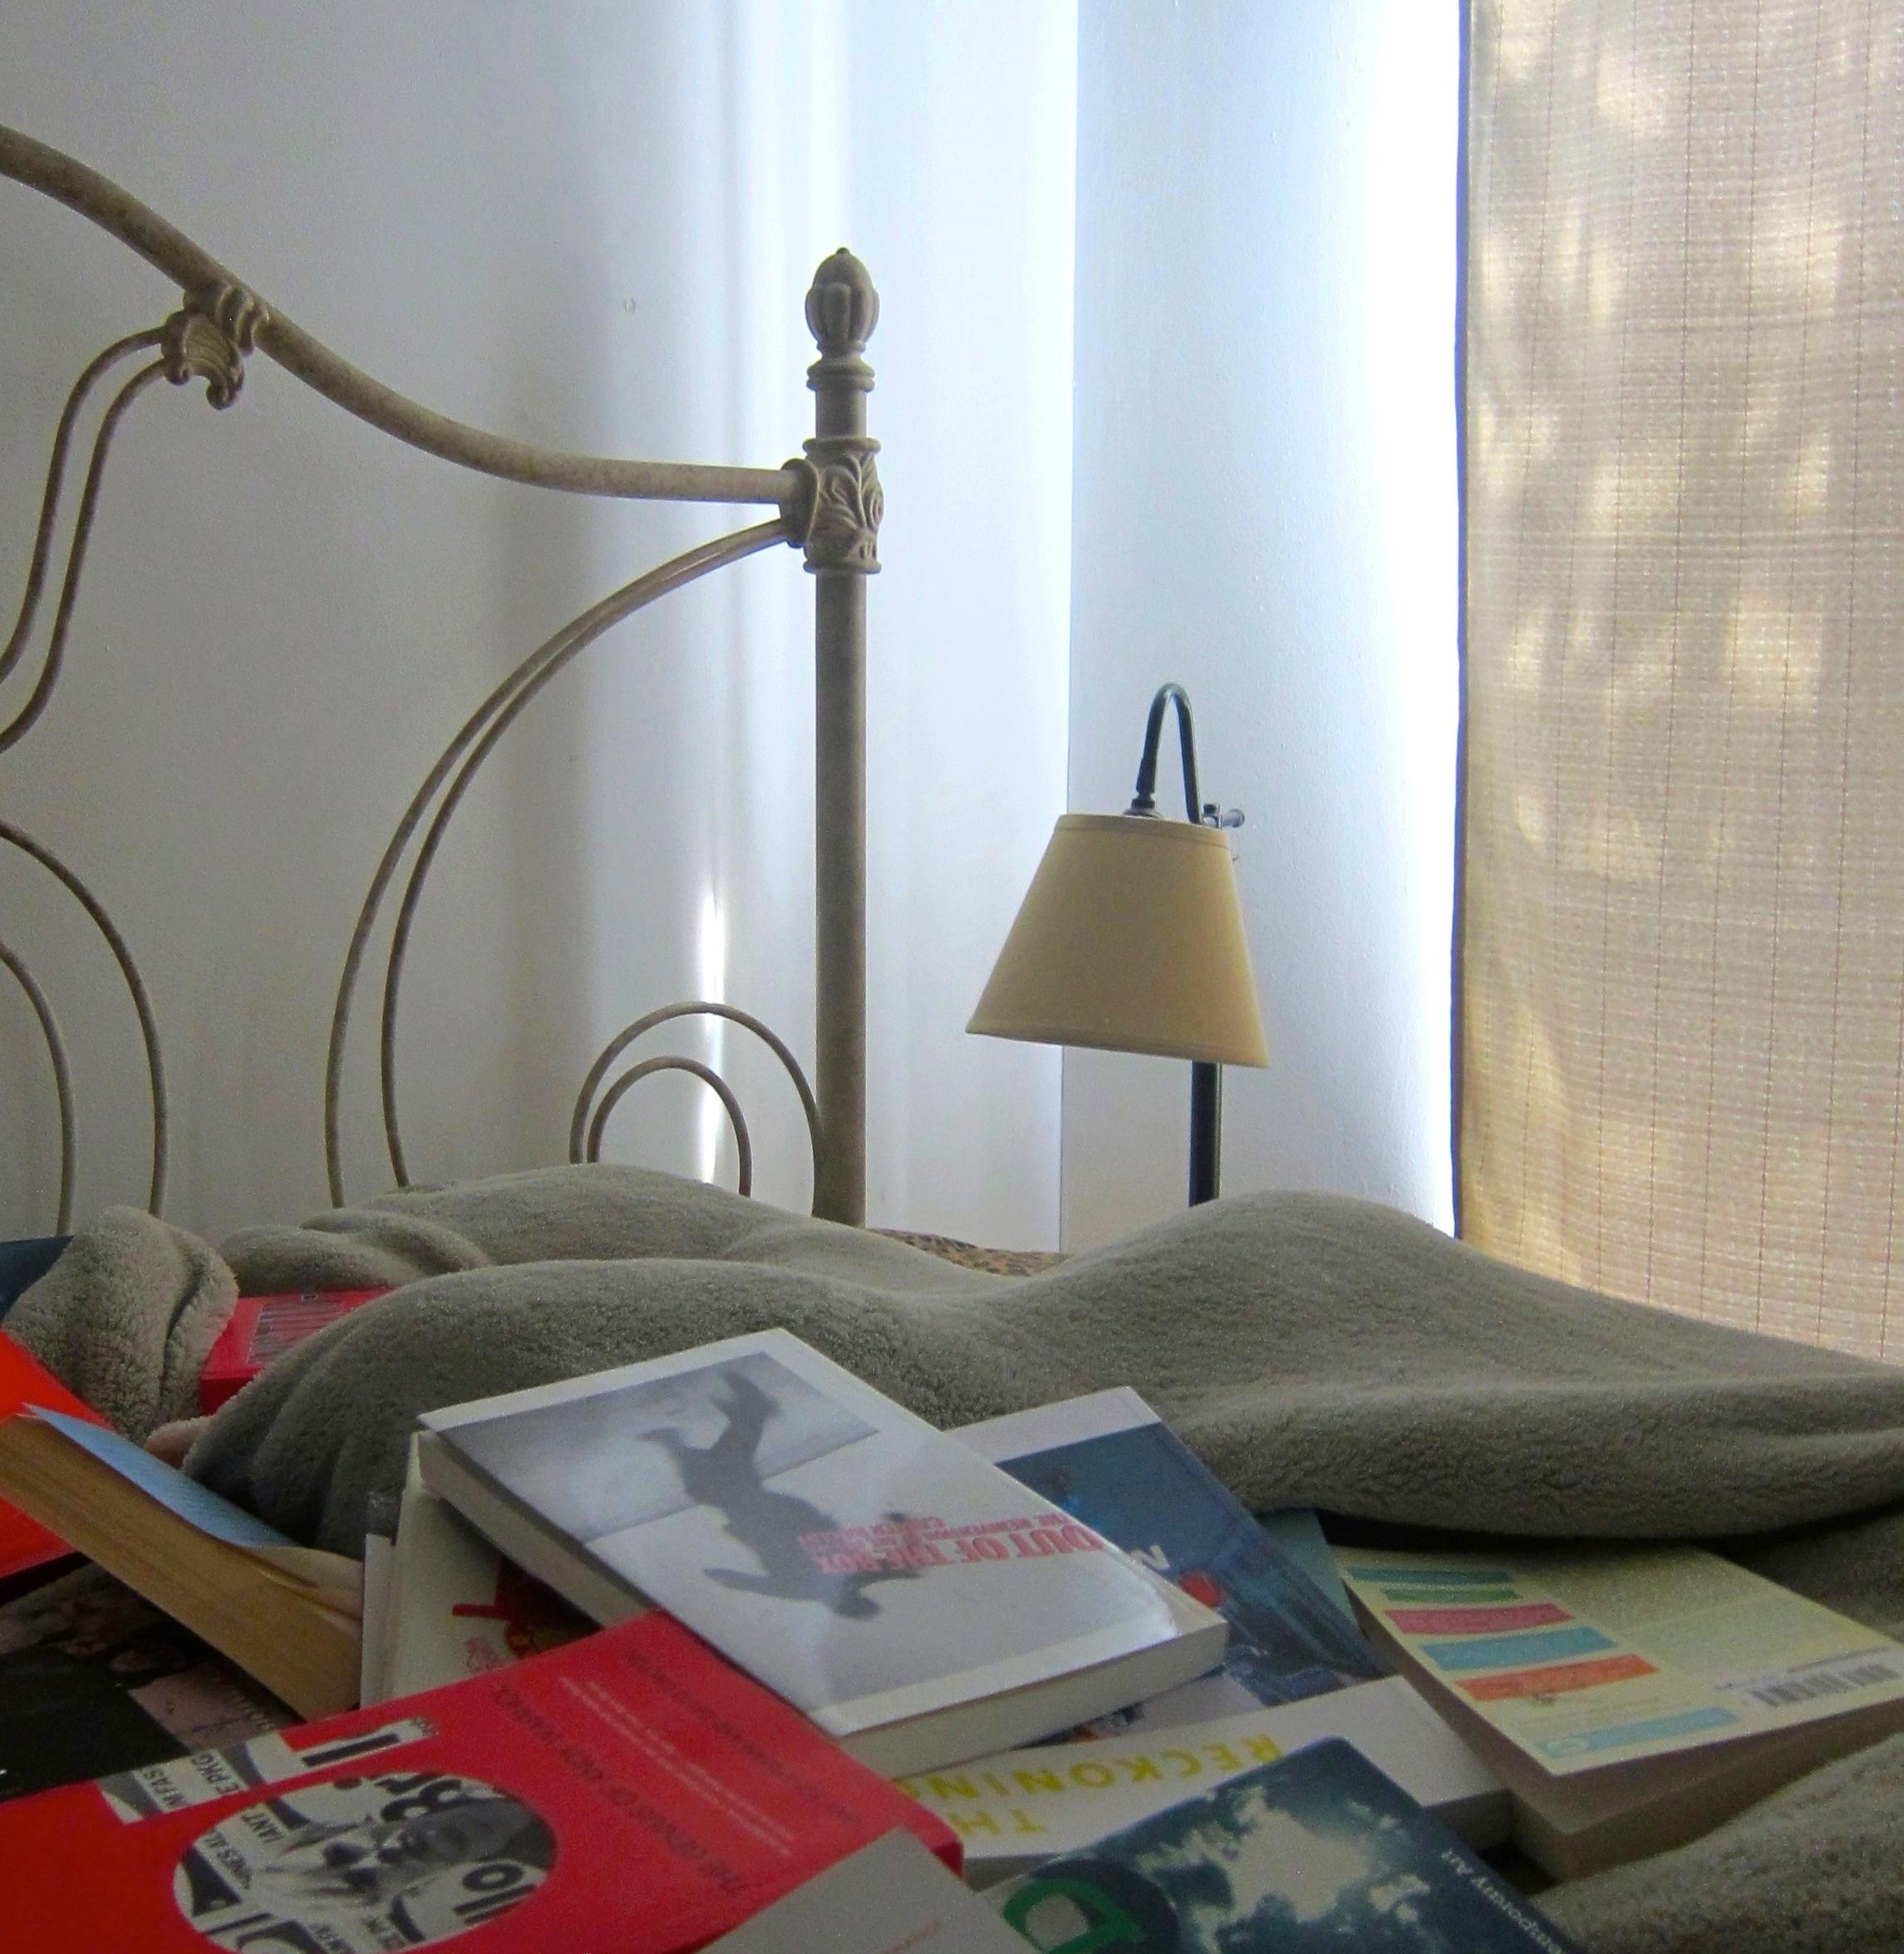 Katya Grokhovsky, Katya's bed, 2014